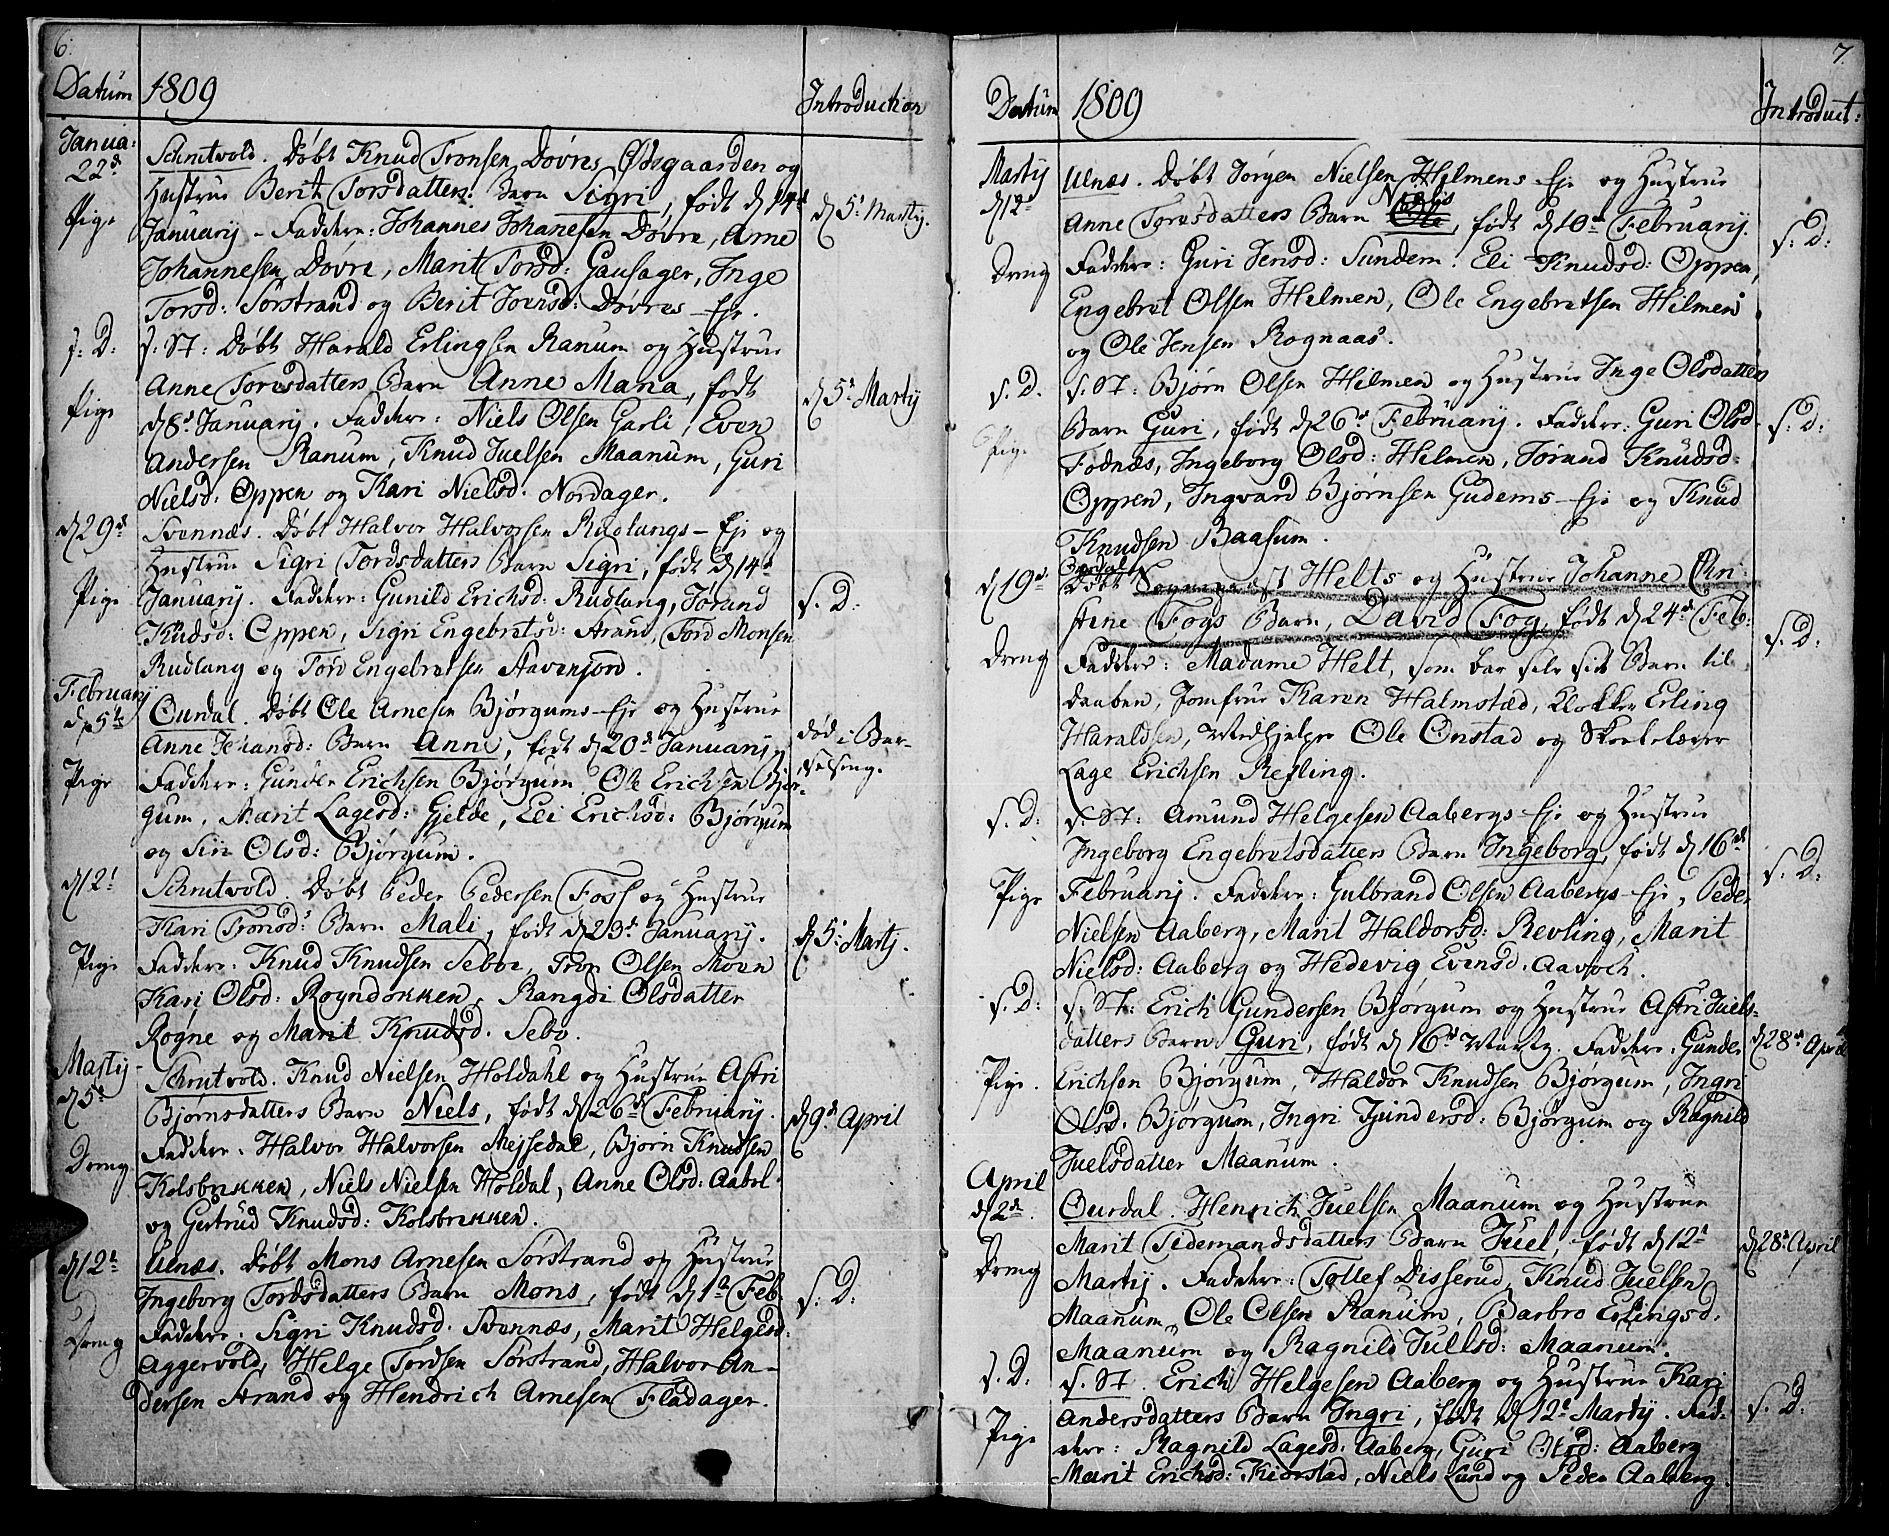 SAH, Nord-Aurdal prestekontor, Ministerialbok nr. 1, 1808-1815, s. 6-7